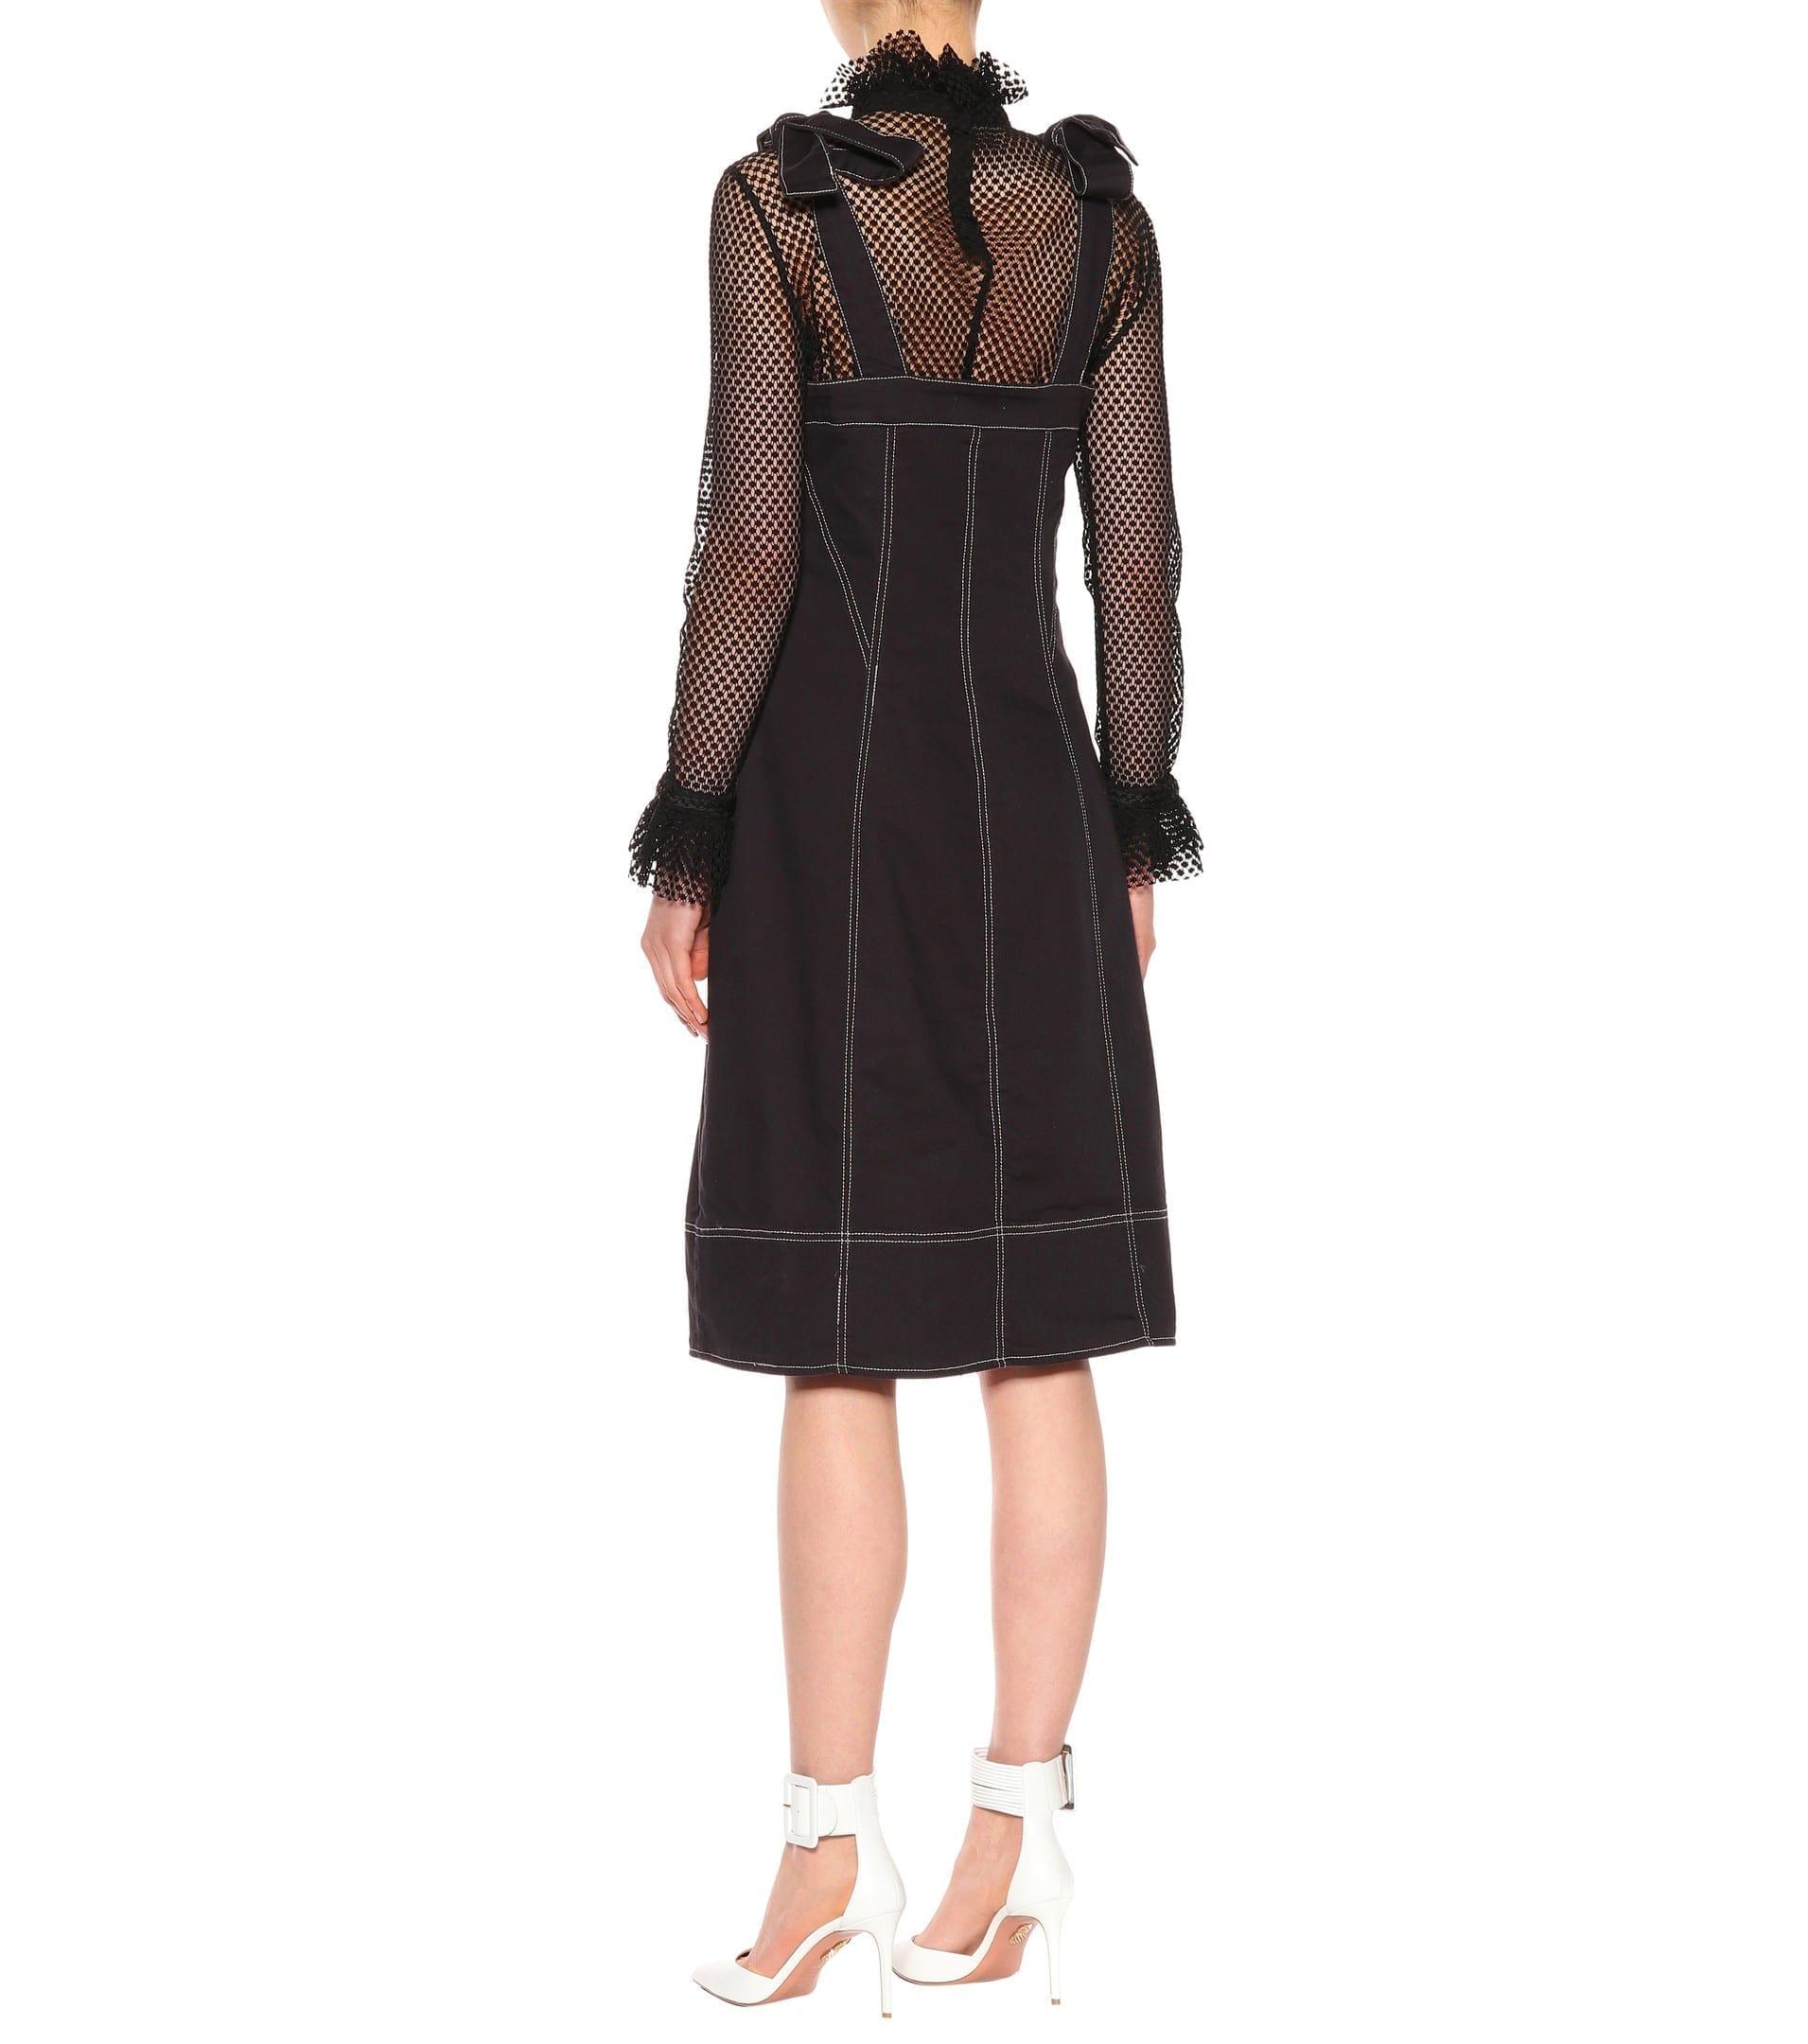 b487ecb0984 ULLA JOHNSON Emory Denim Jet Black Dress - We Select Dresses